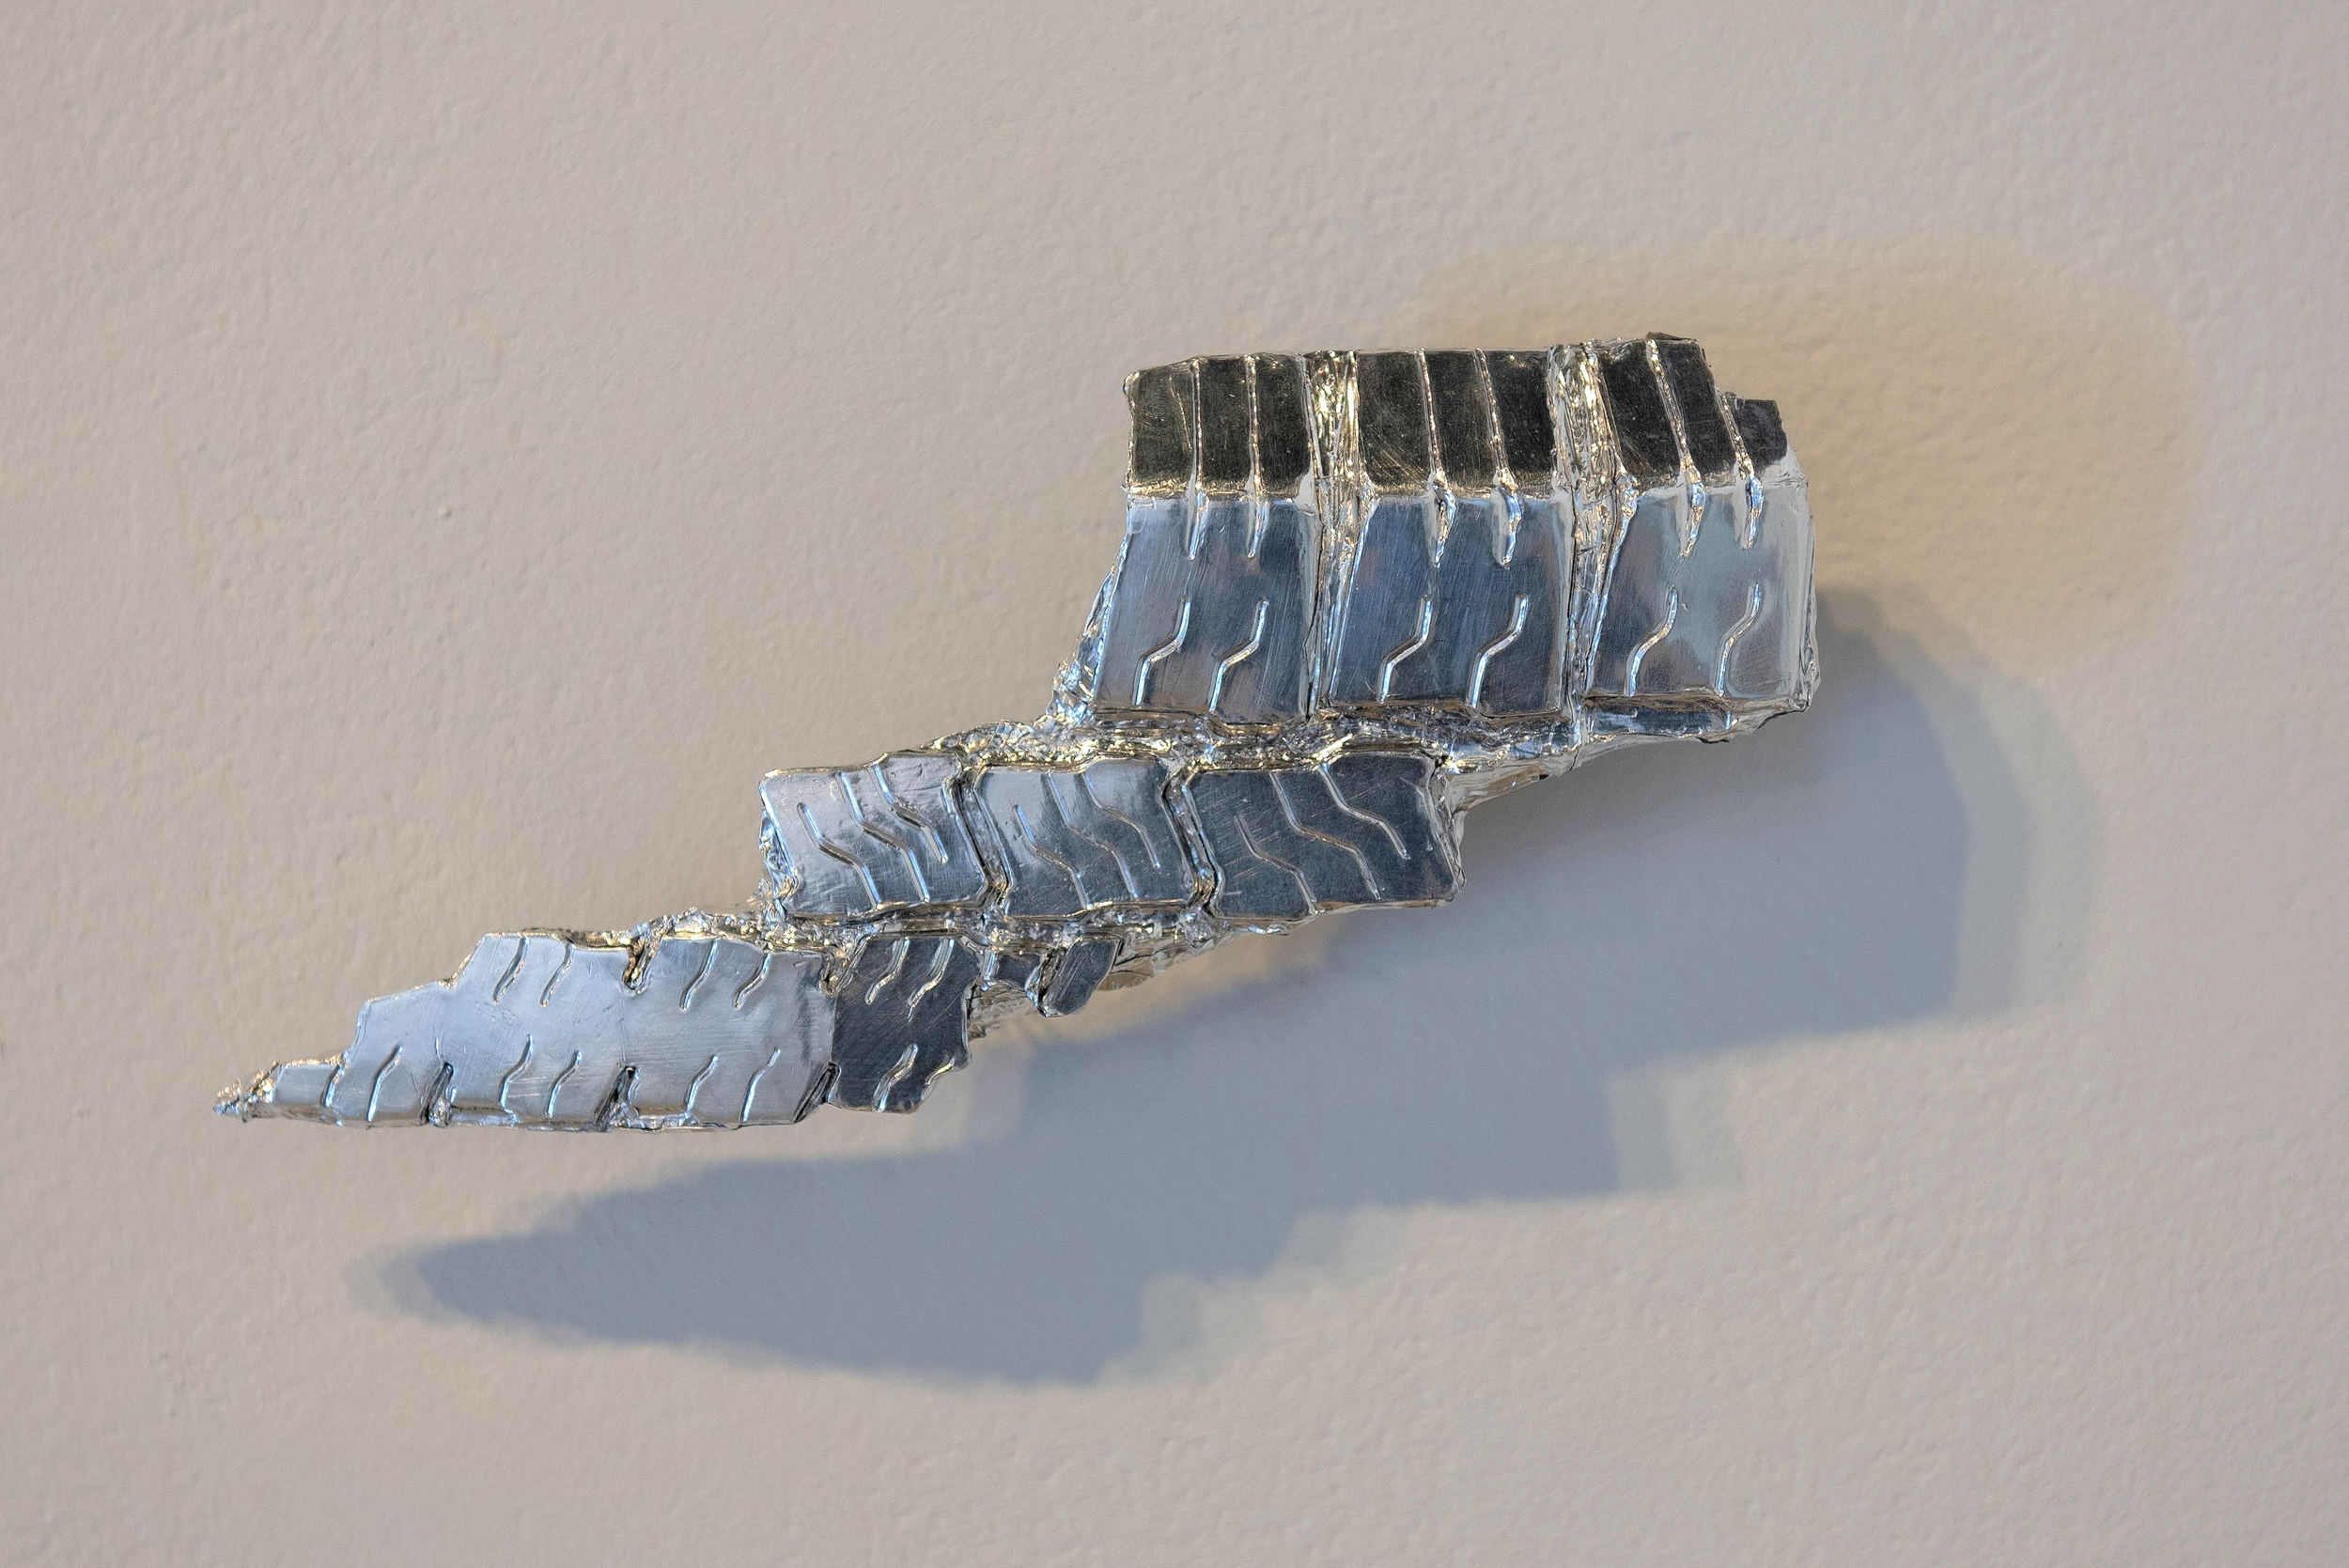 Proof Megan Burchett Minneapolis, MN Tire, electrical tape 2018 $225